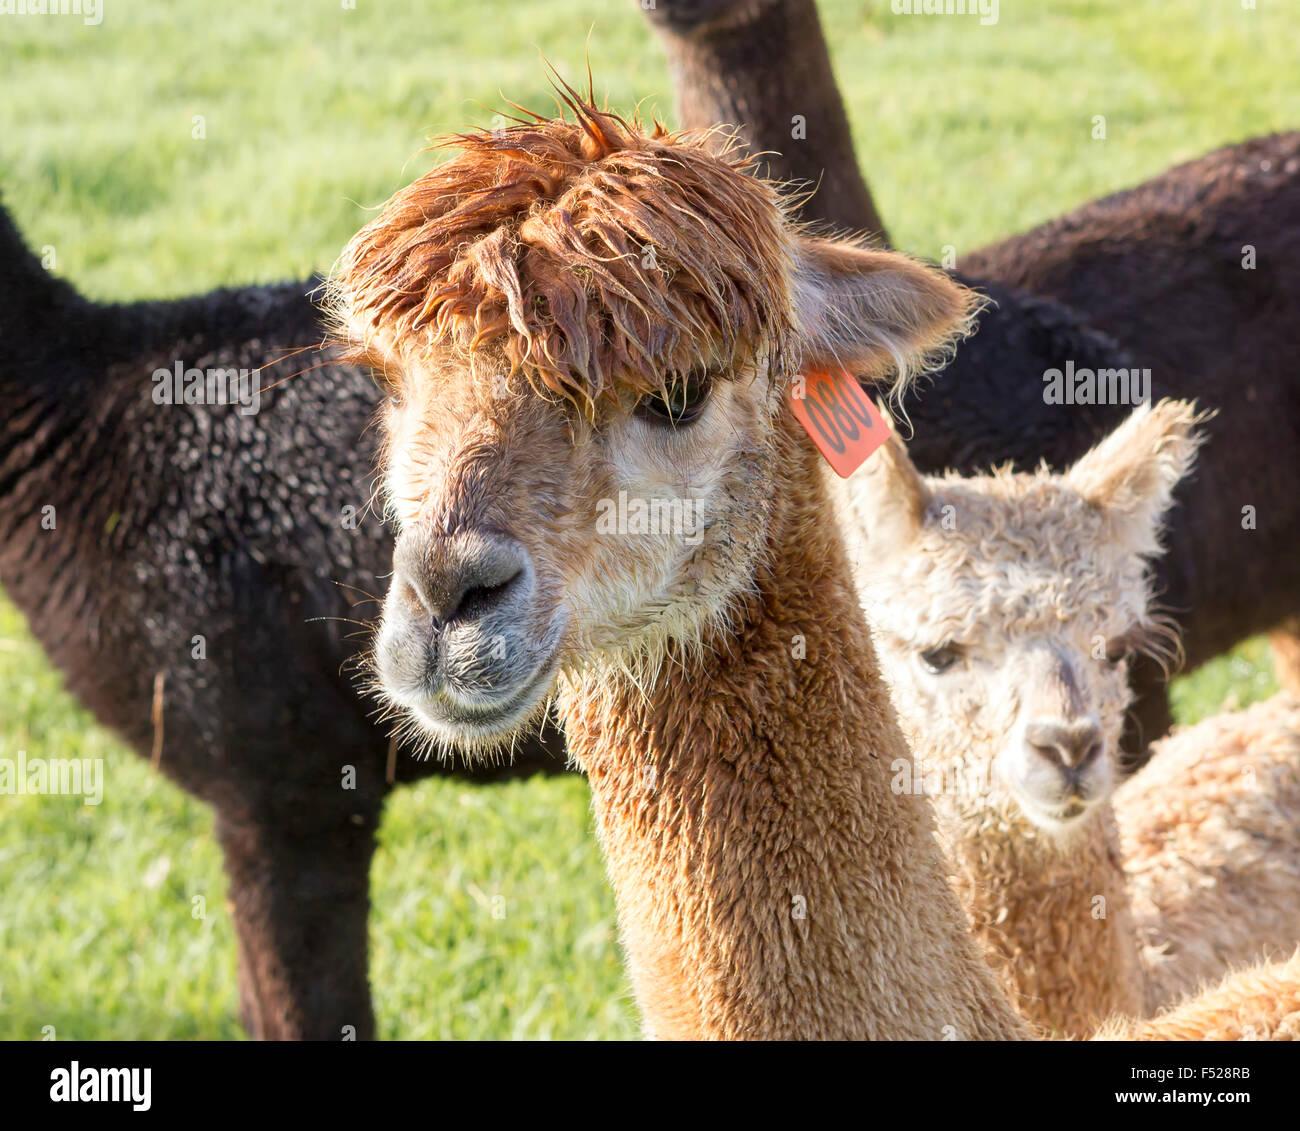 Alpaca On Alpaca farm Located in Australia - Stock Image